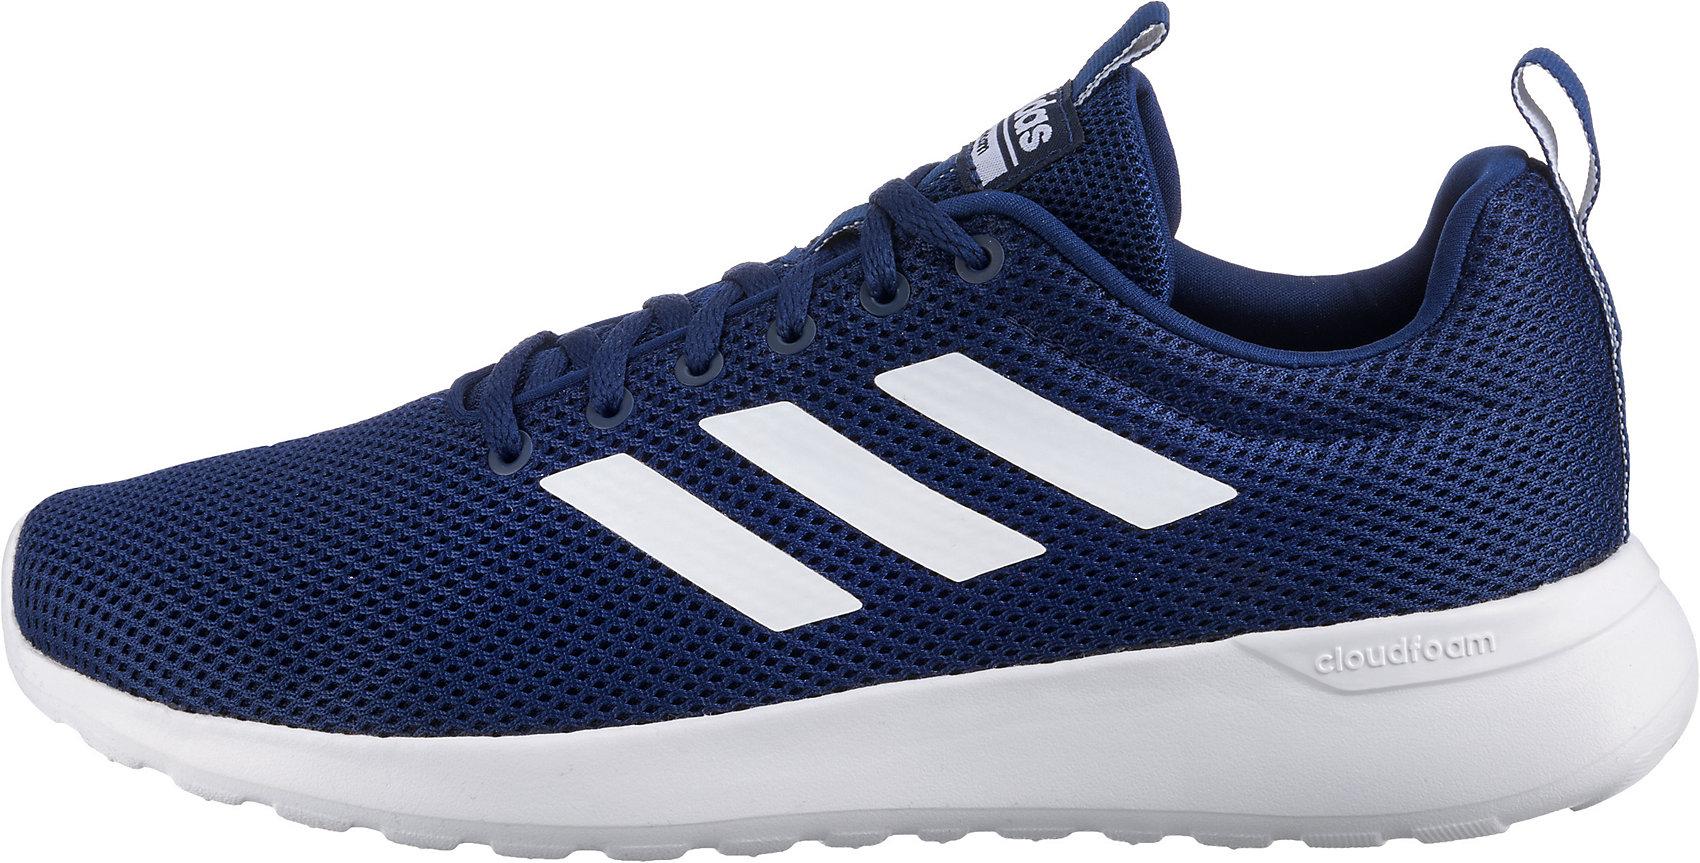 adidas Sport Inspired, 8K Sneakers Low, grau | mirapodo